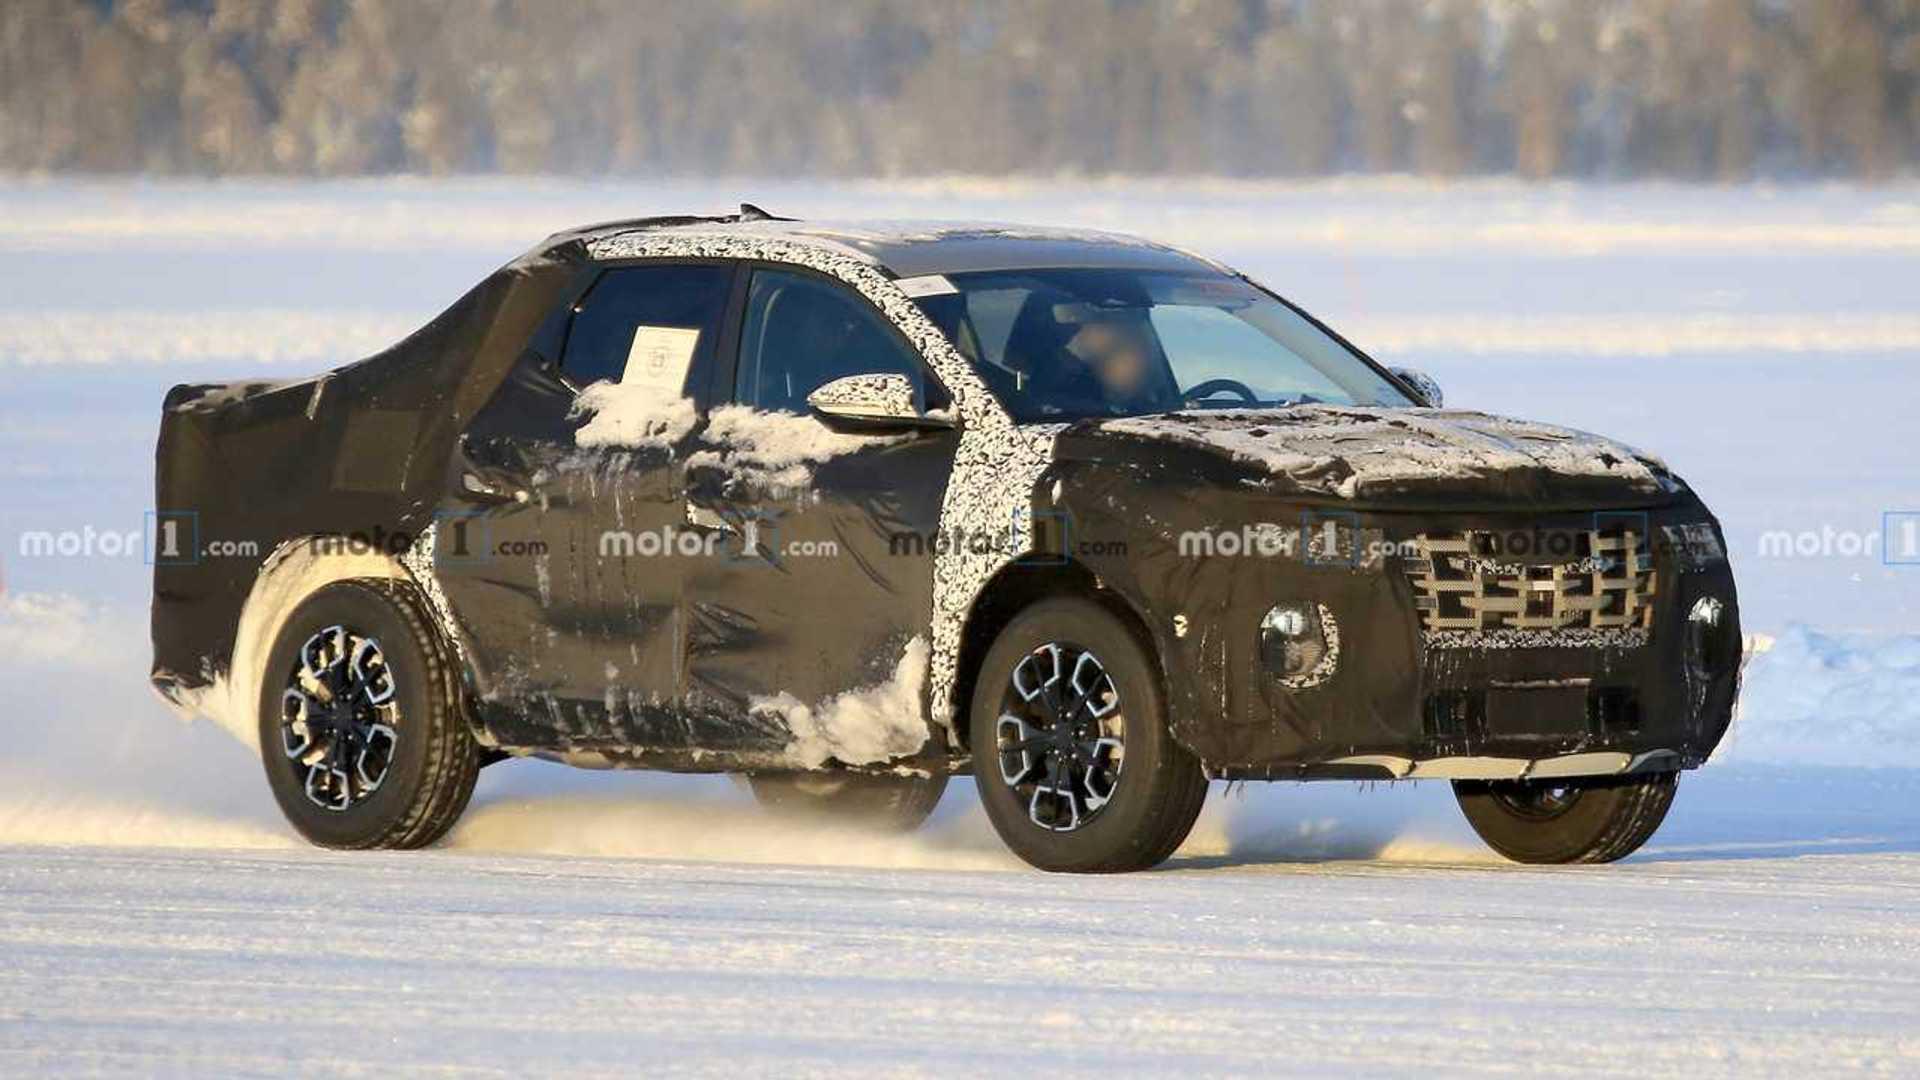 Hyundai Santa Cruz Pickup Spied Looking Snowy In 24 Photos